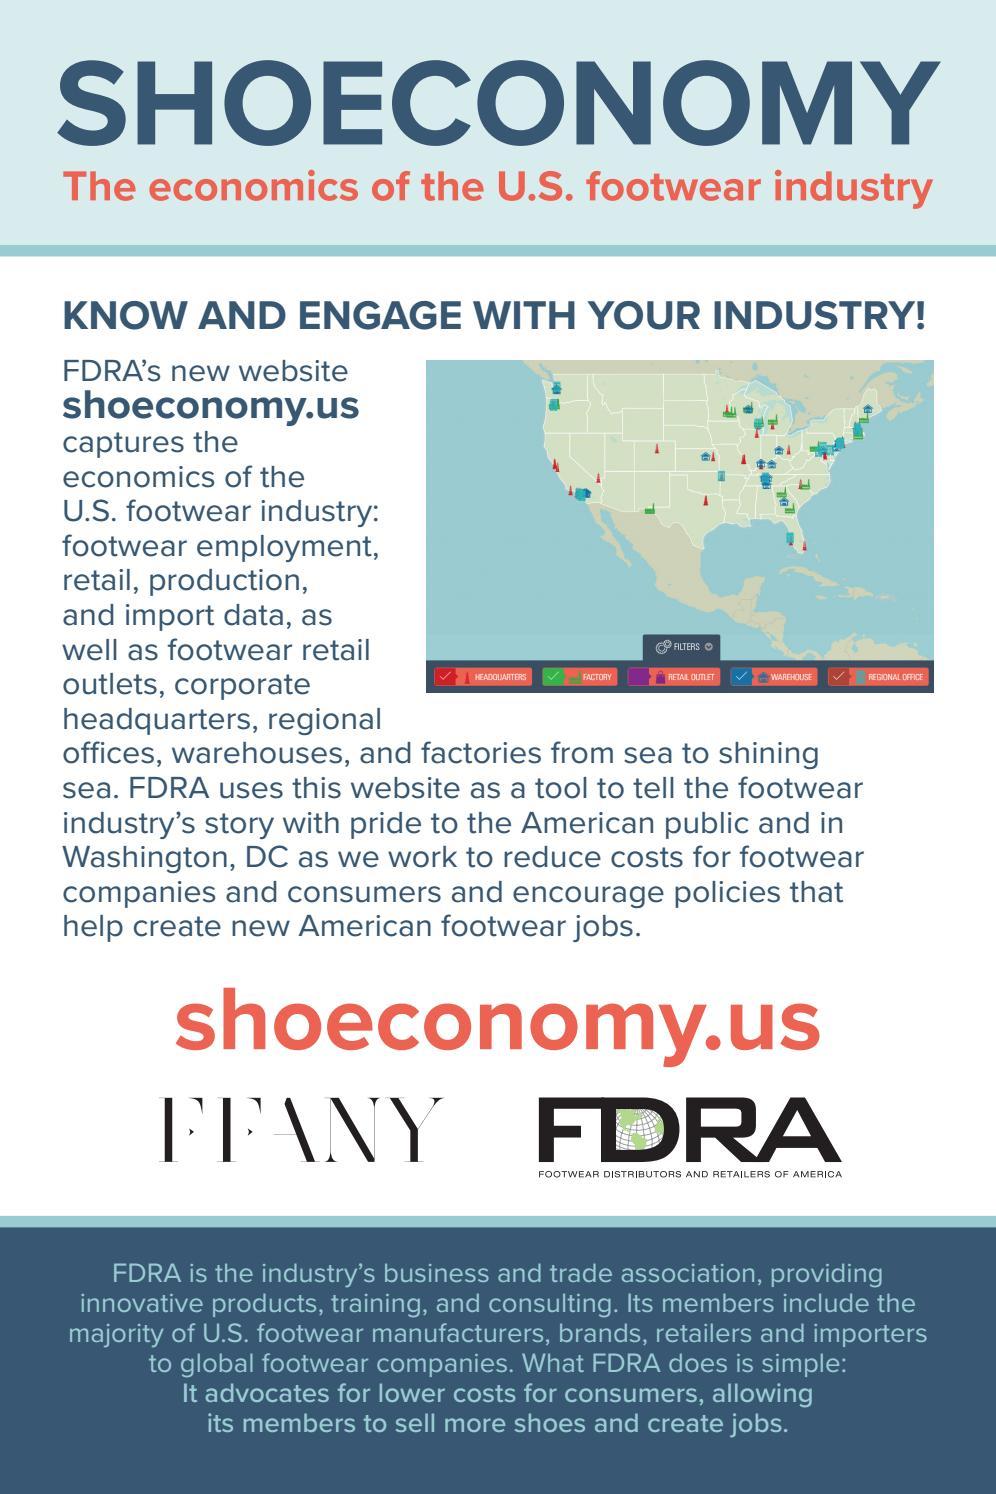 FFANY New York Shoe Expo Directory: Nov 29 - Dec 1, 2017 by FFANY